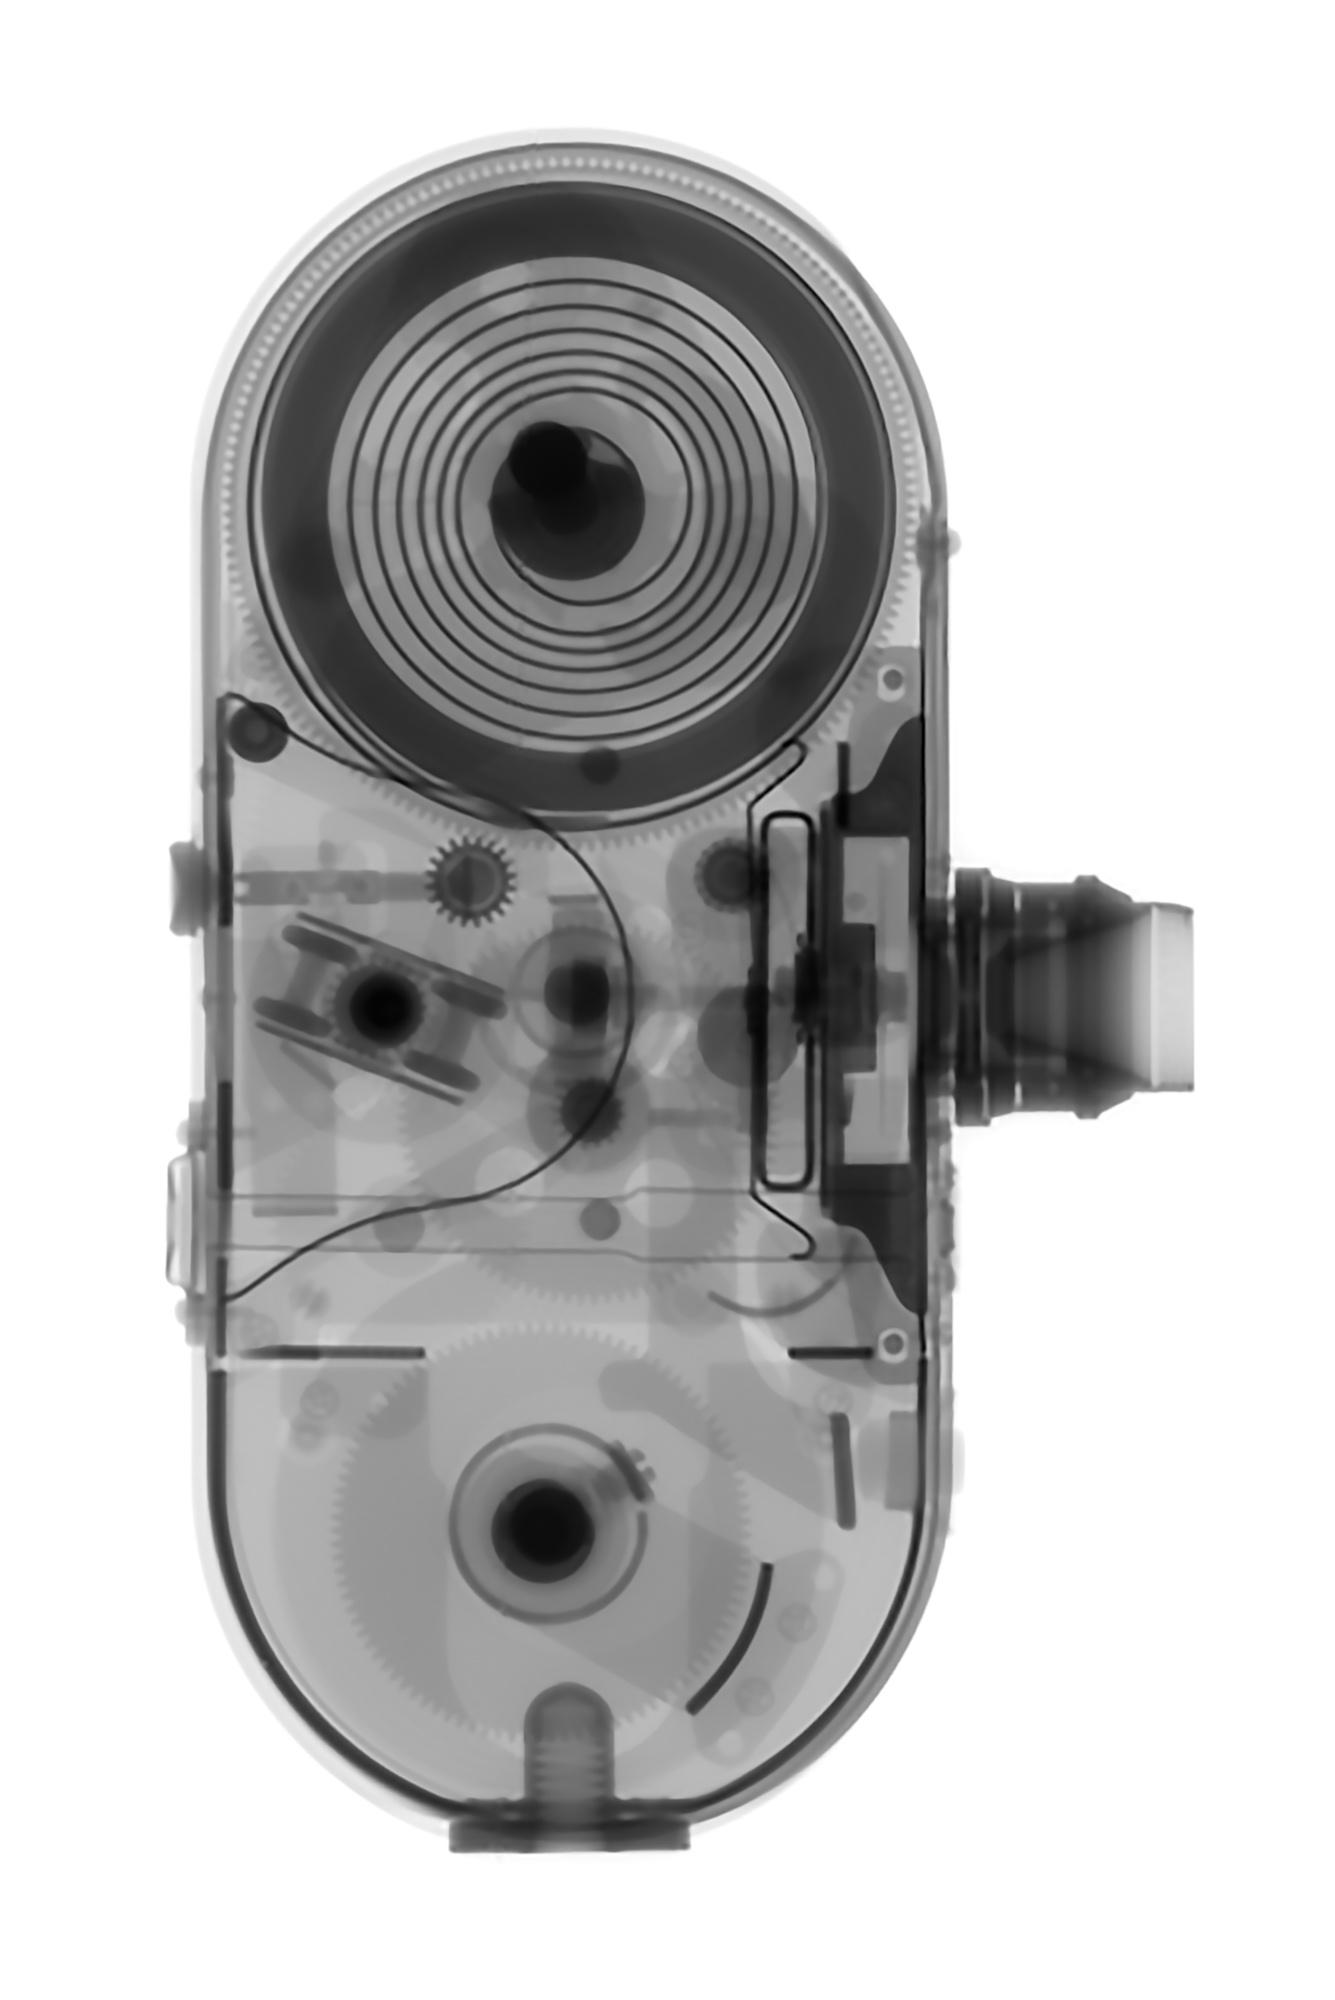 Keystone K-8 8mm